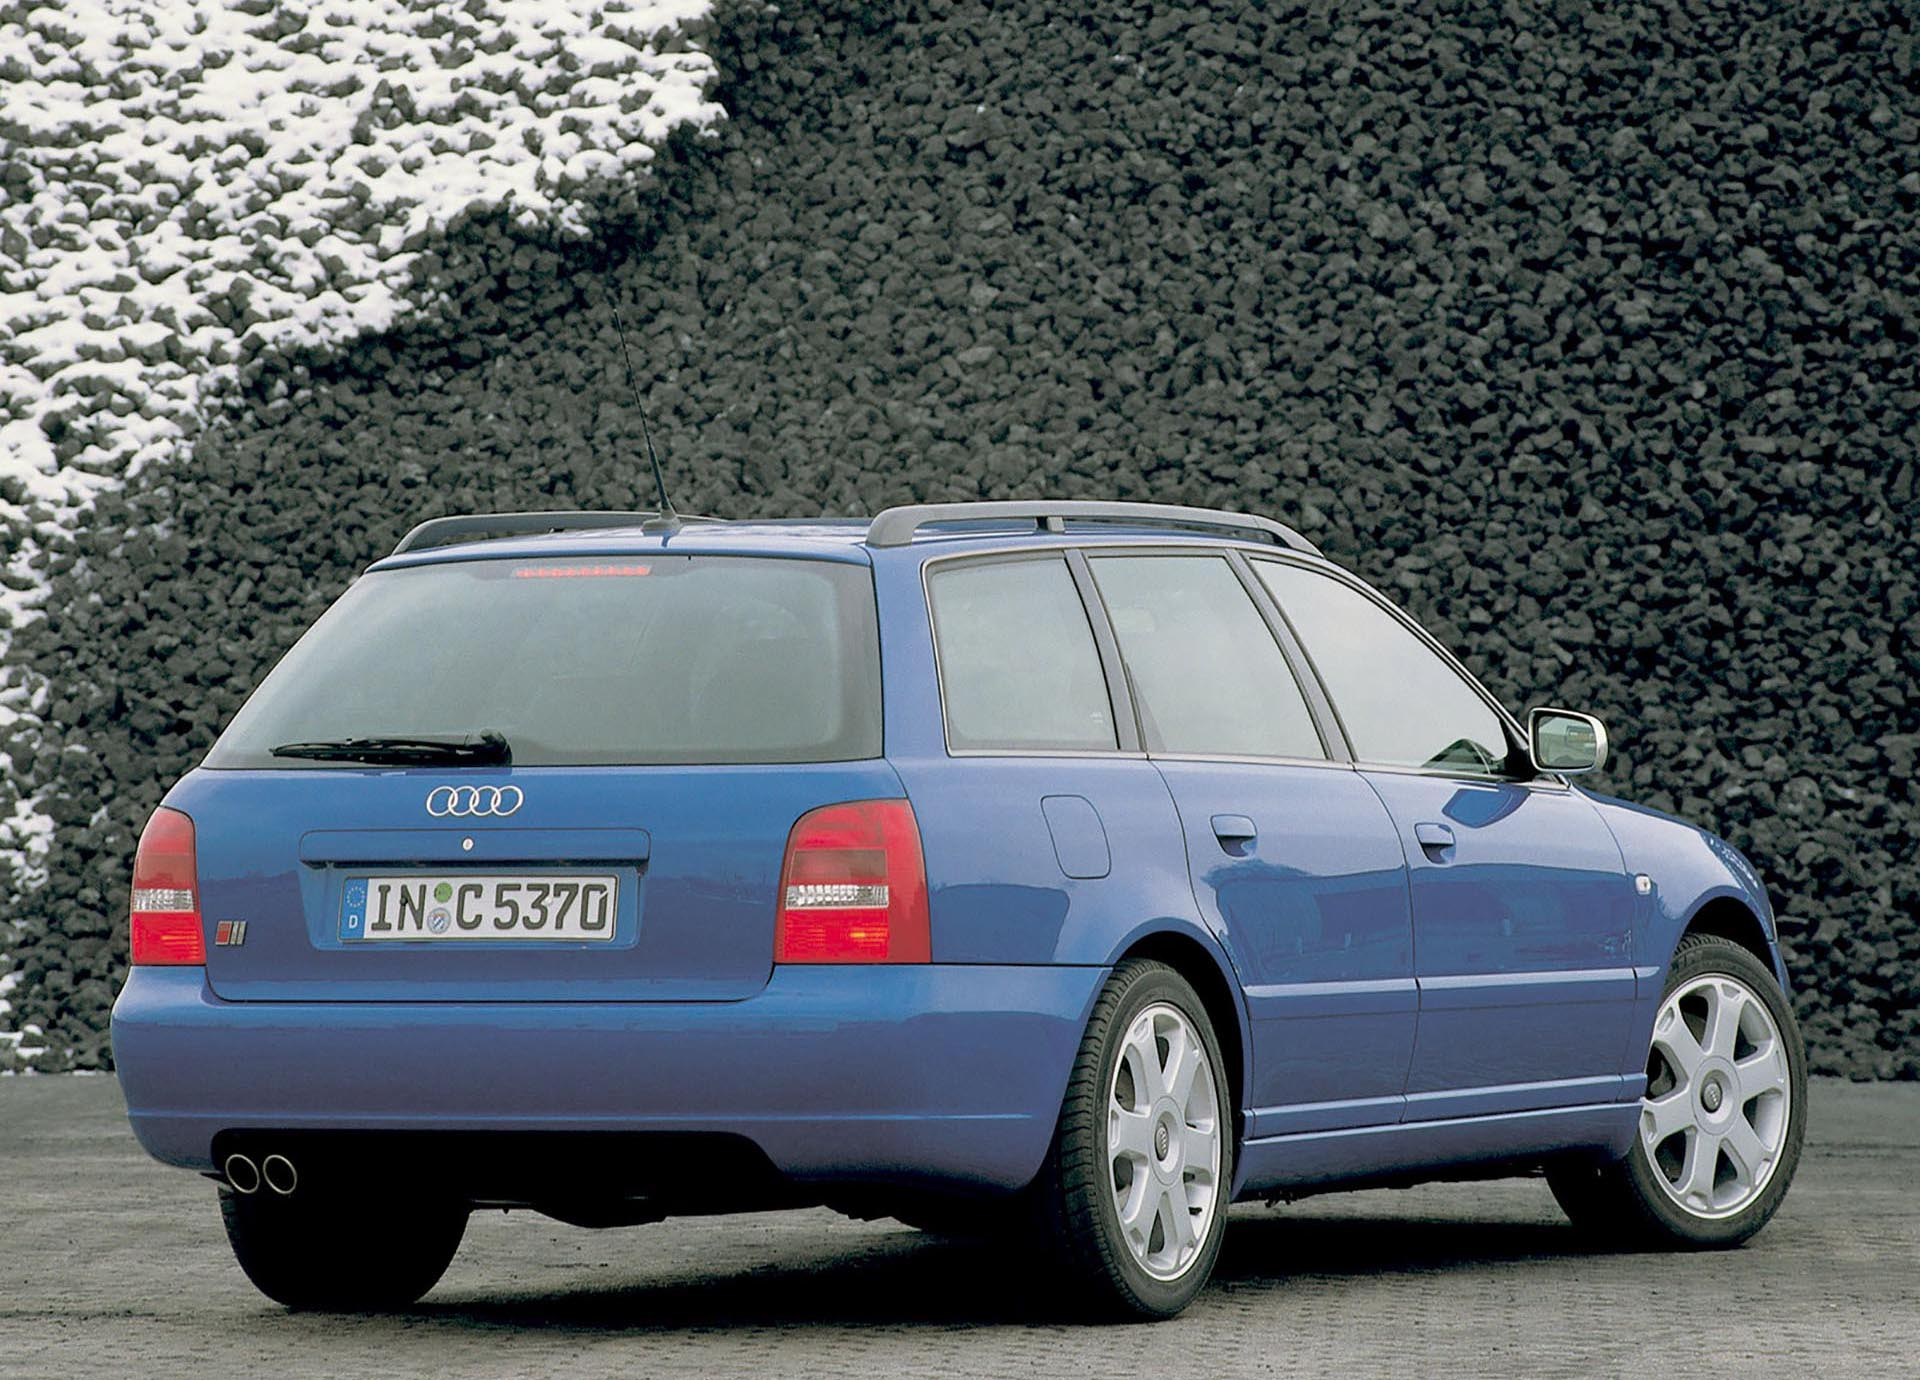 03_B5 Audi S4 2.7t Avant Nogaro Blue rear